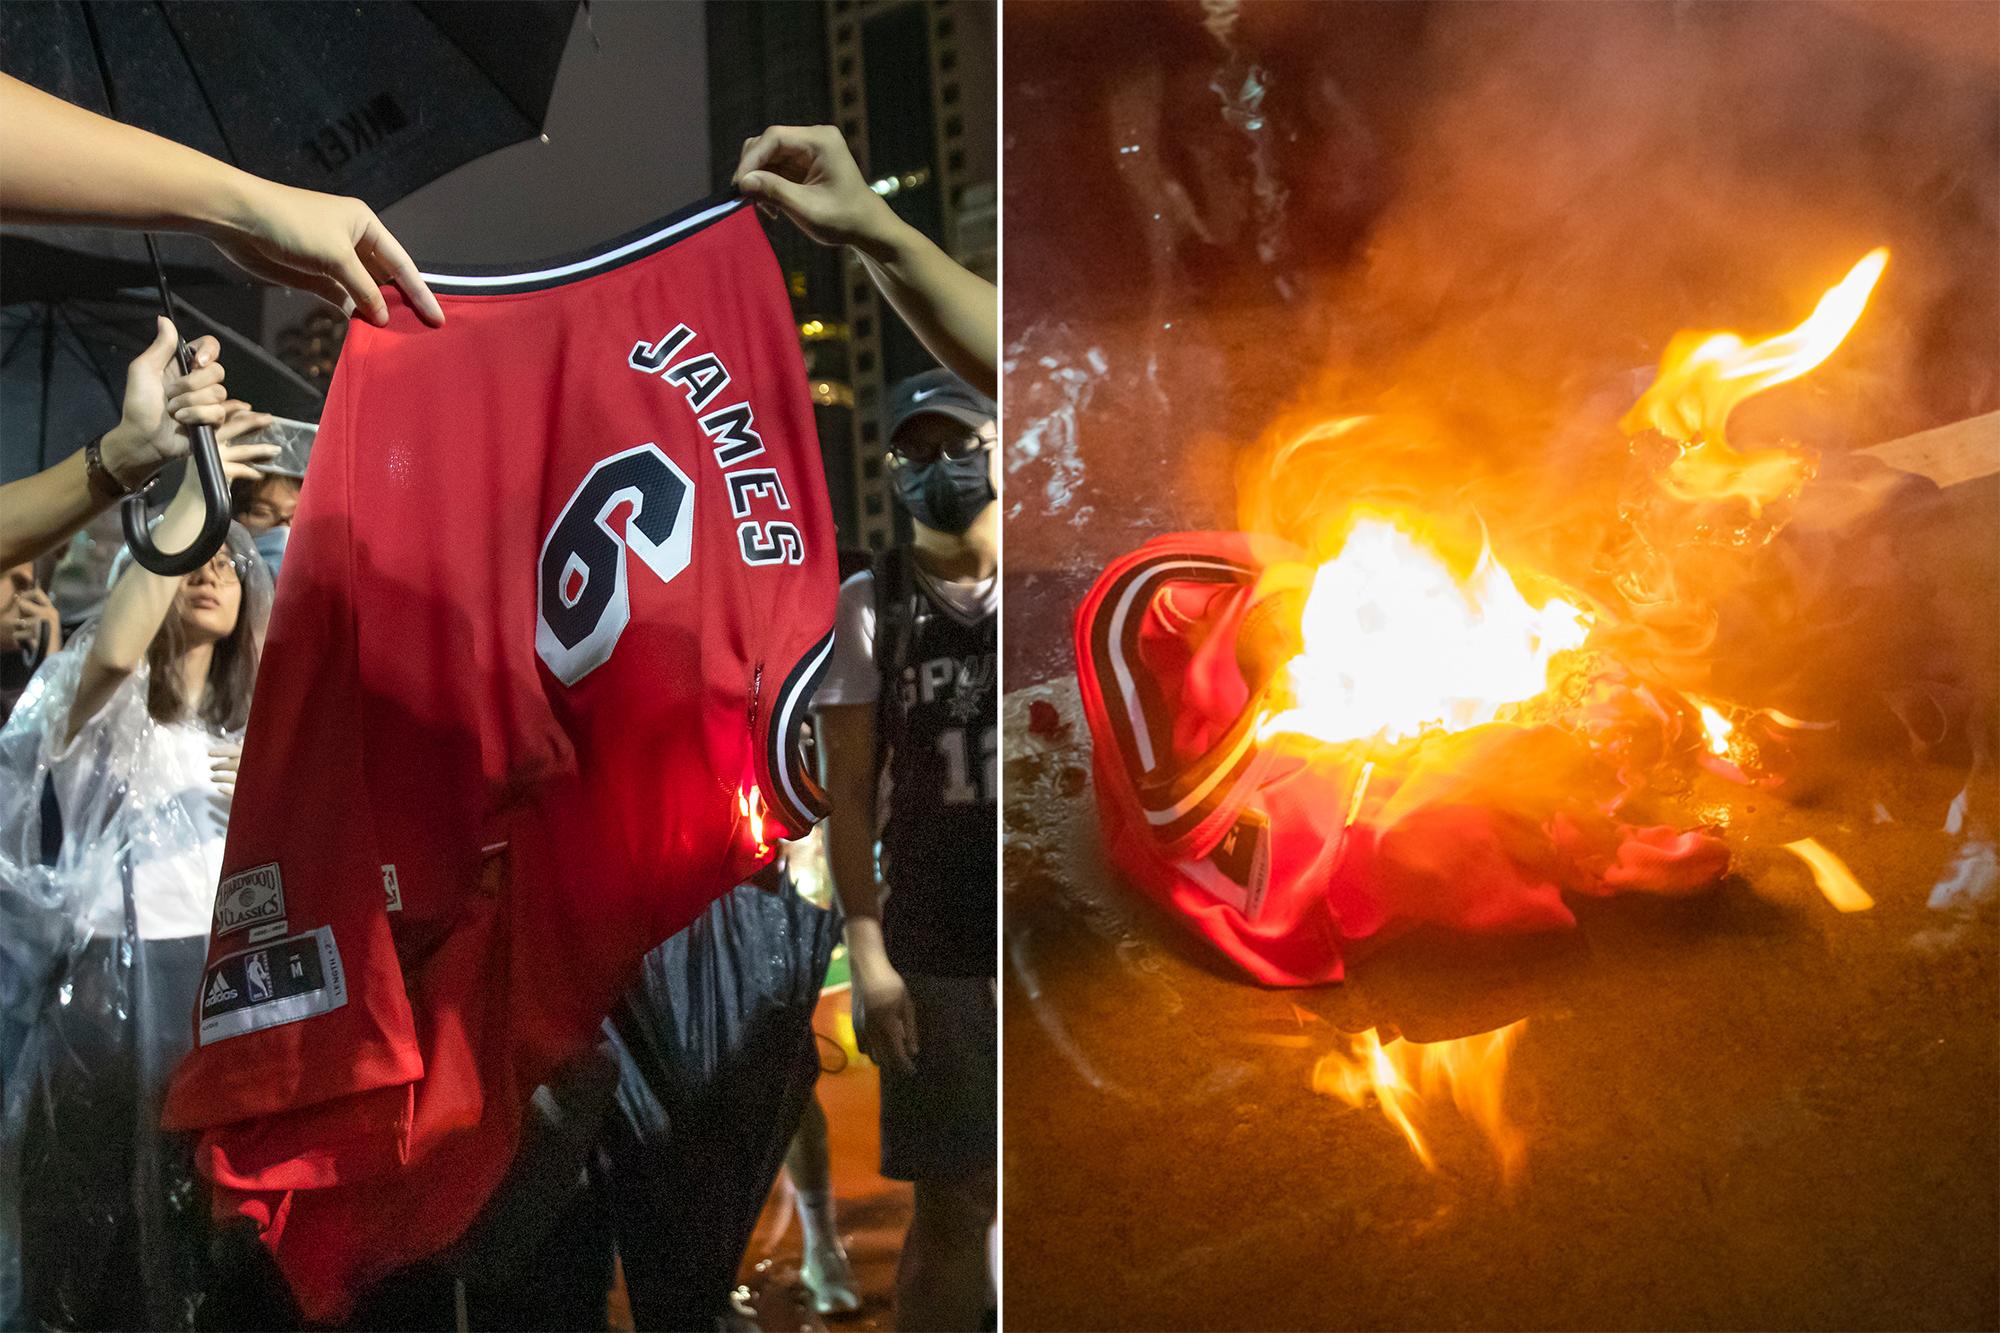 lebron james jersey burning